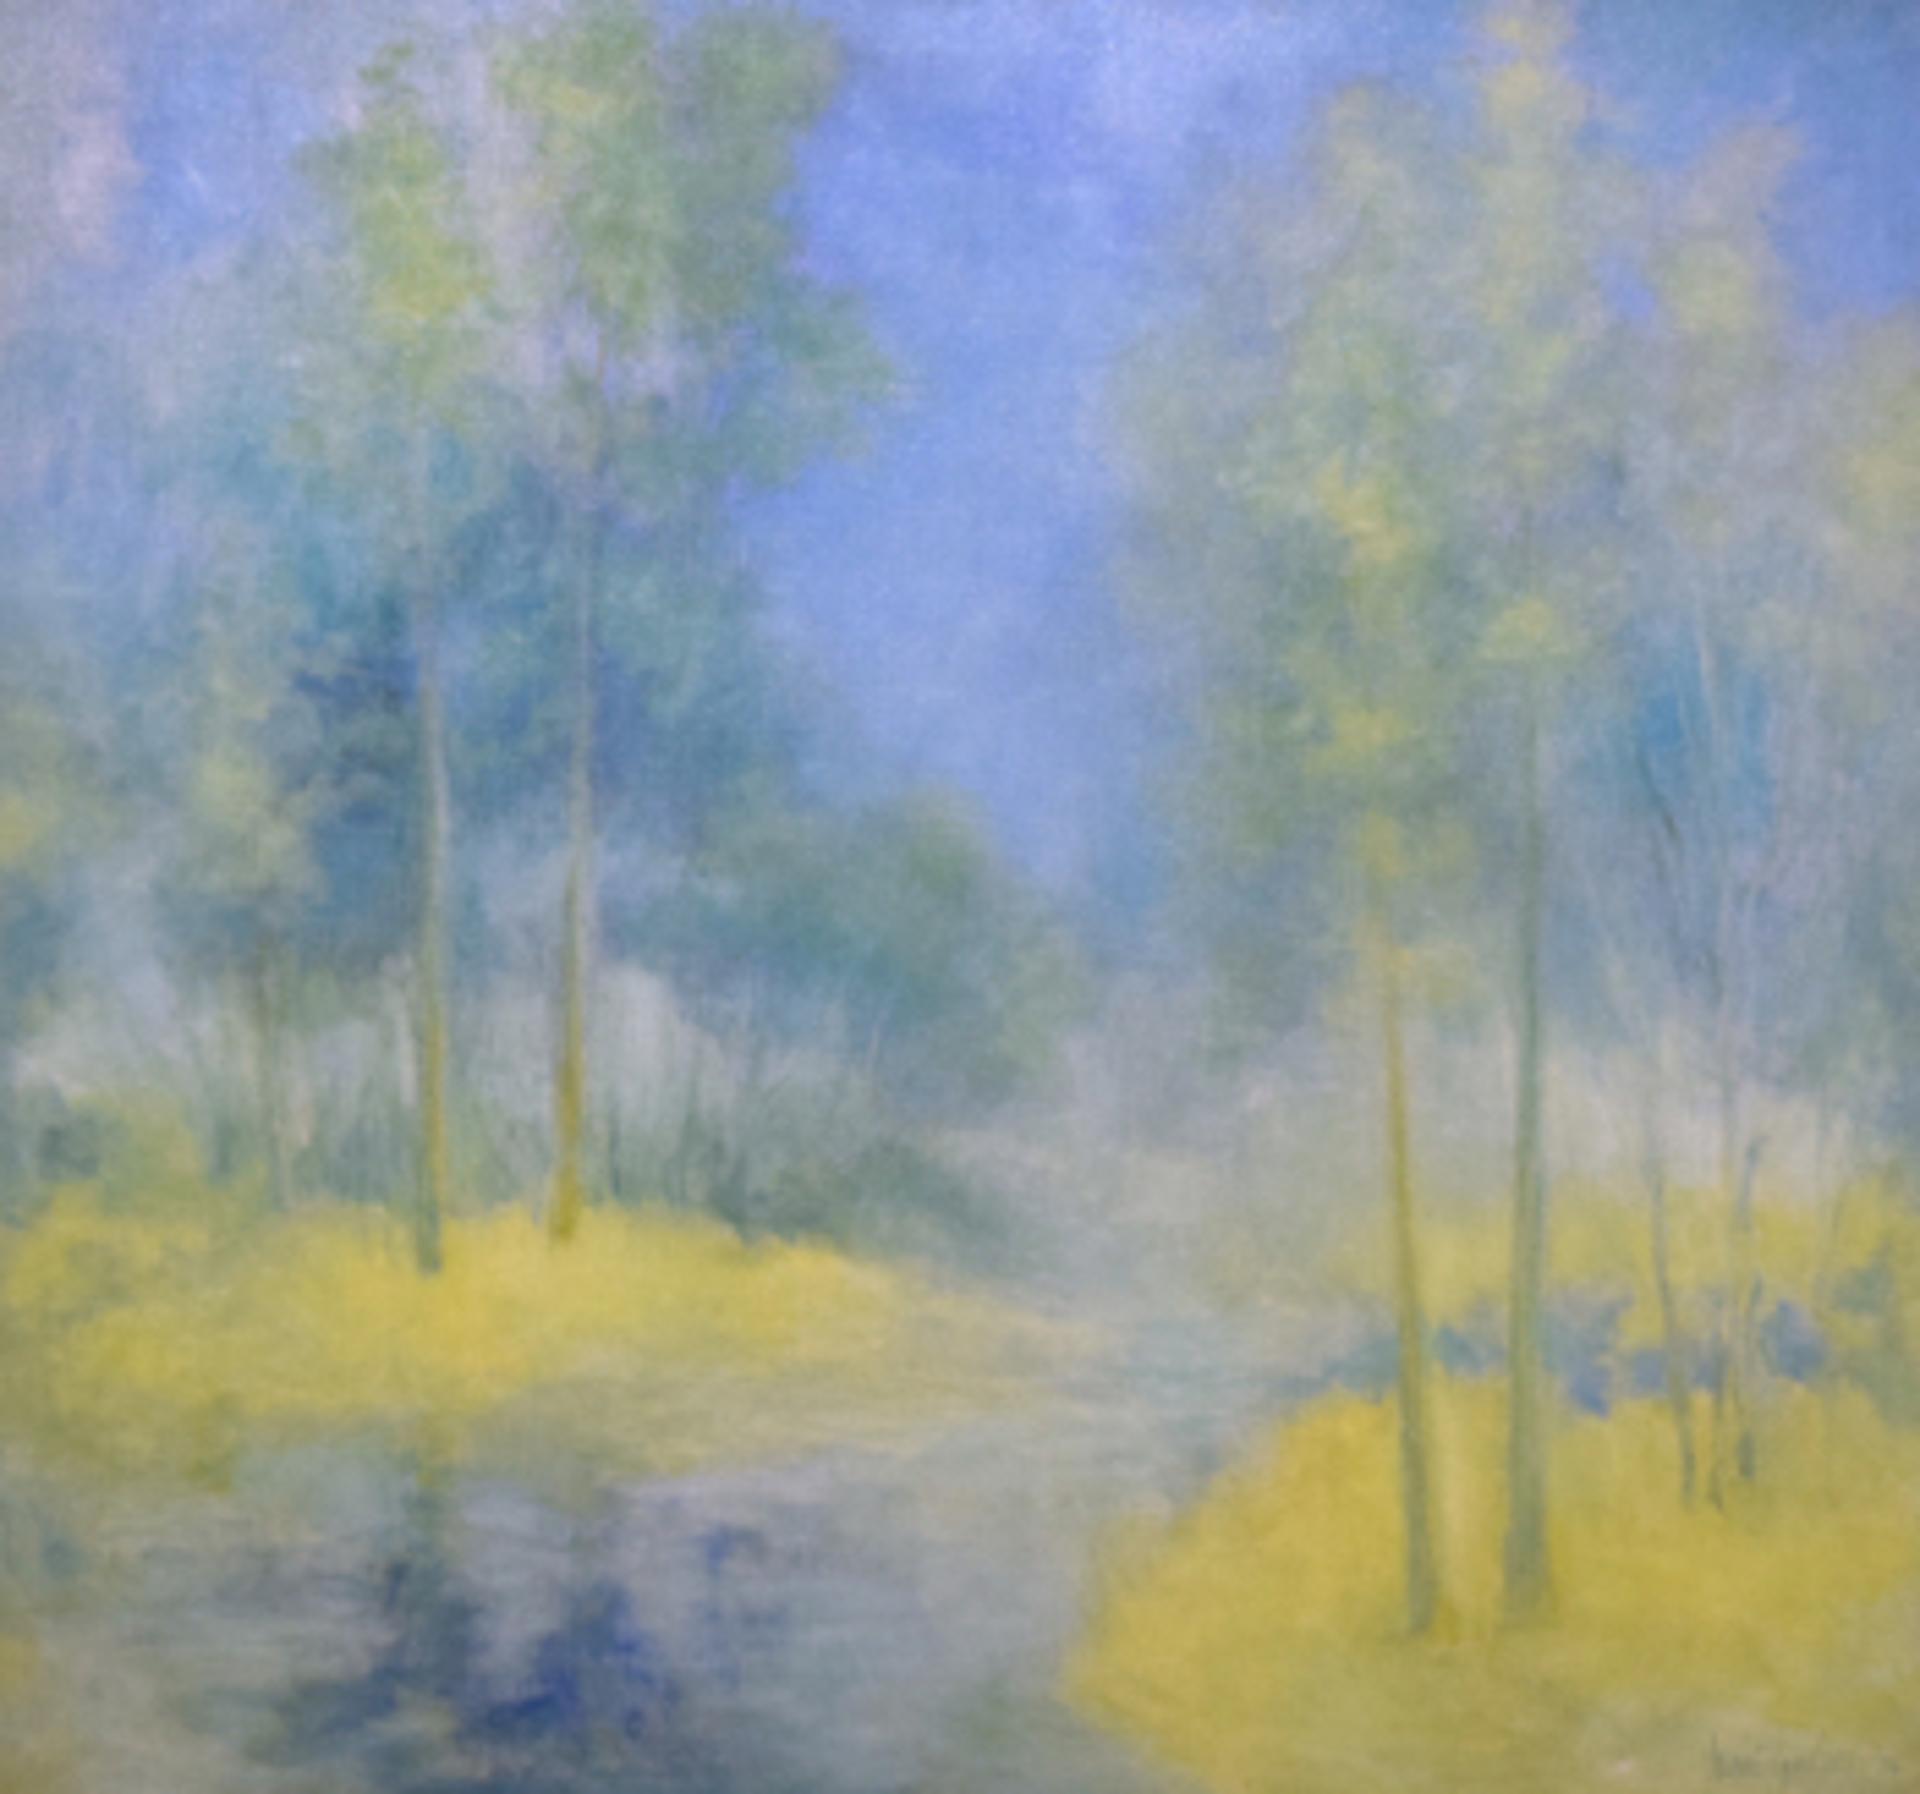 Reflections by Henri Gadbois